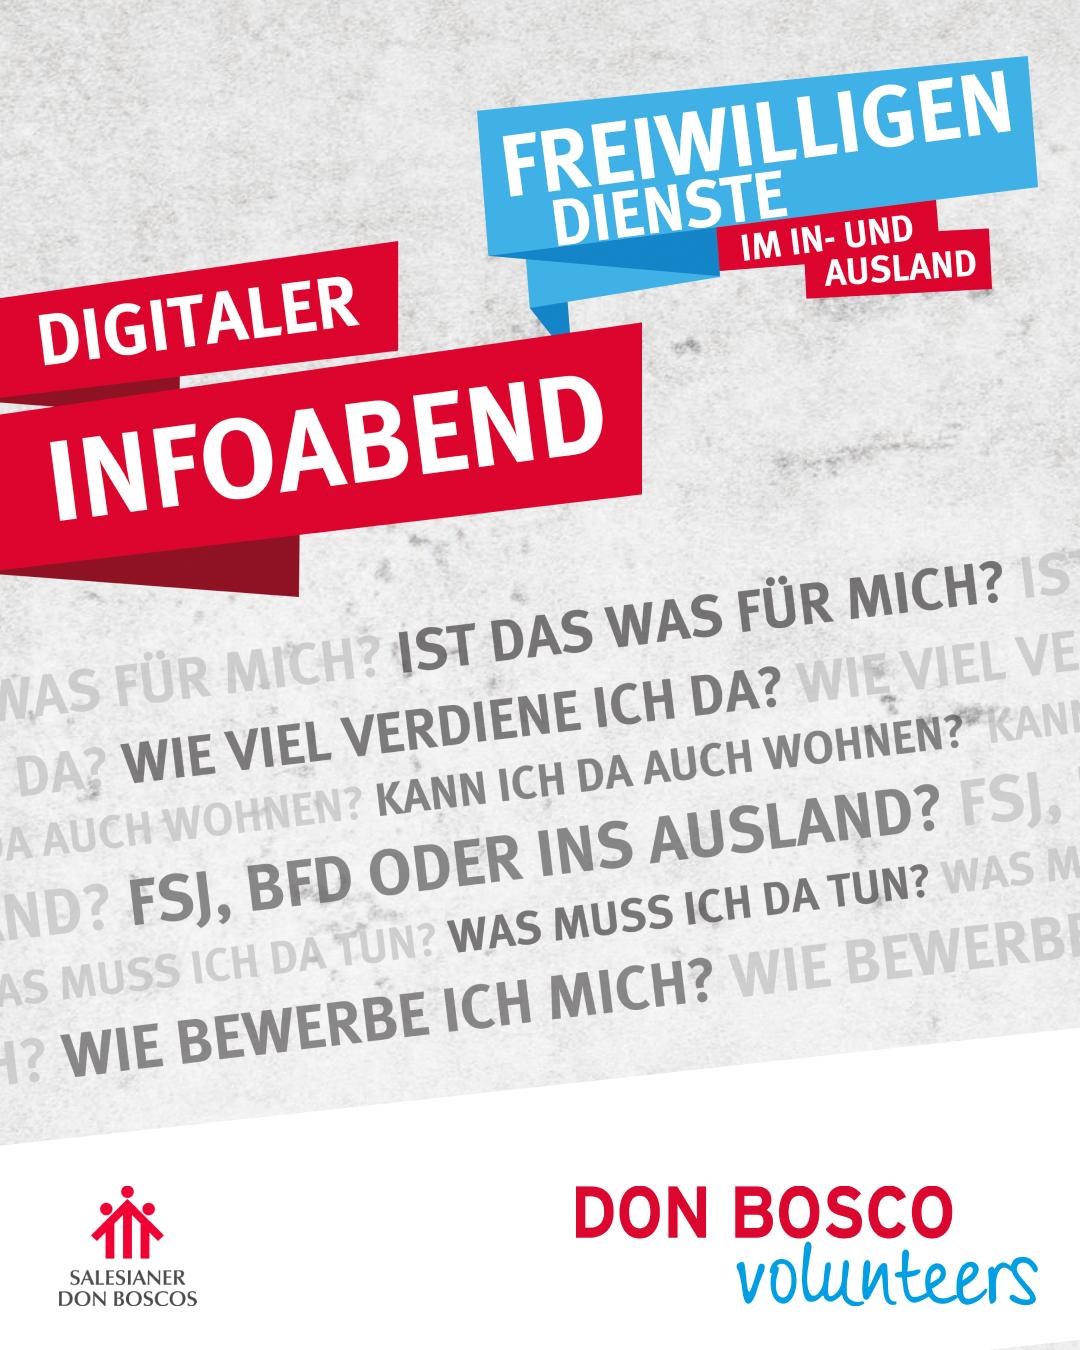 Digitalter Infoabend Don Bosco Volunteers